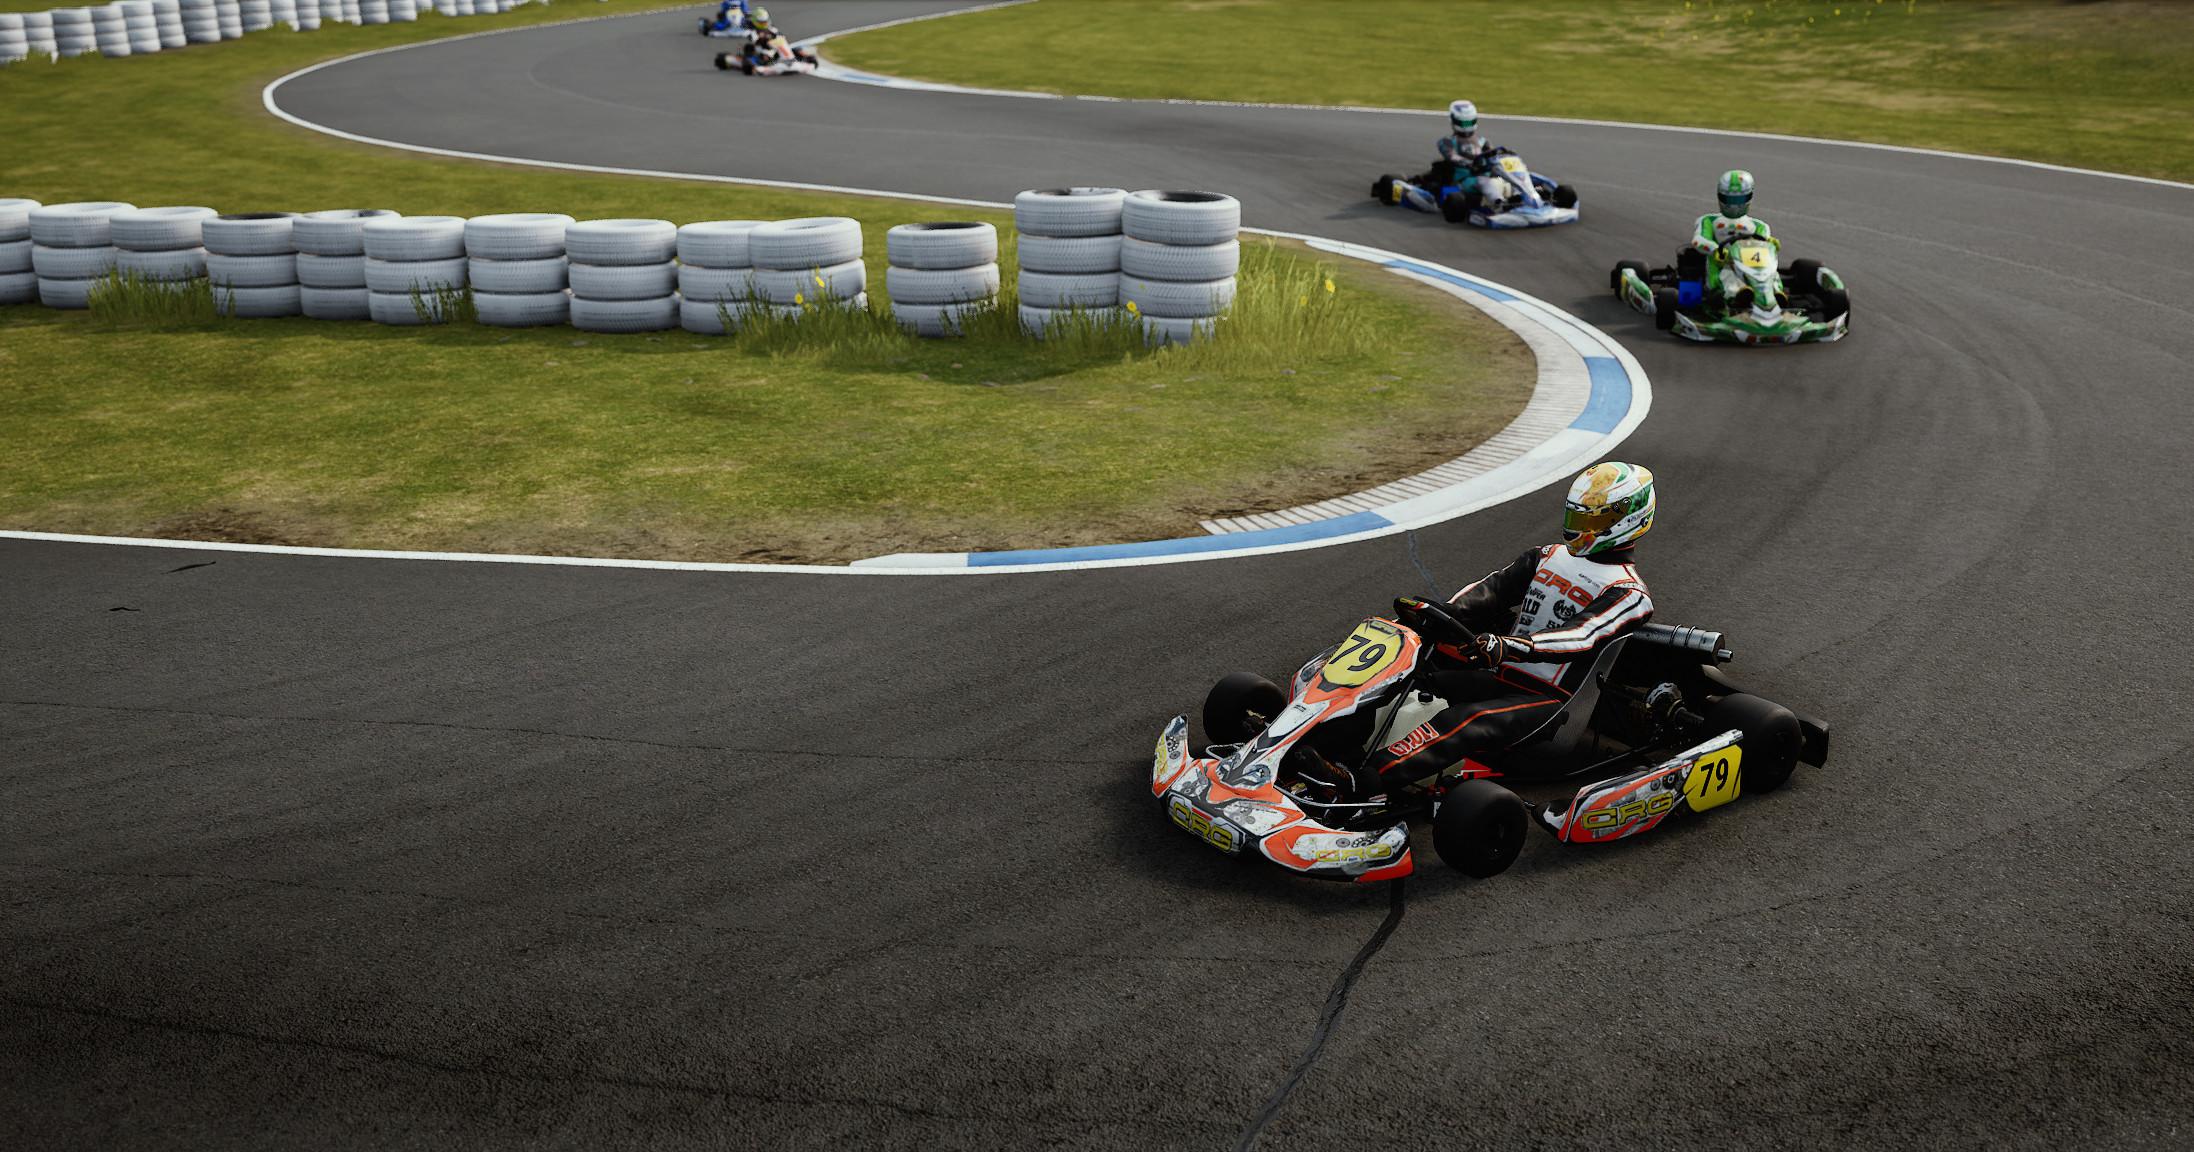 Three karts driving around a corner towards viewer.